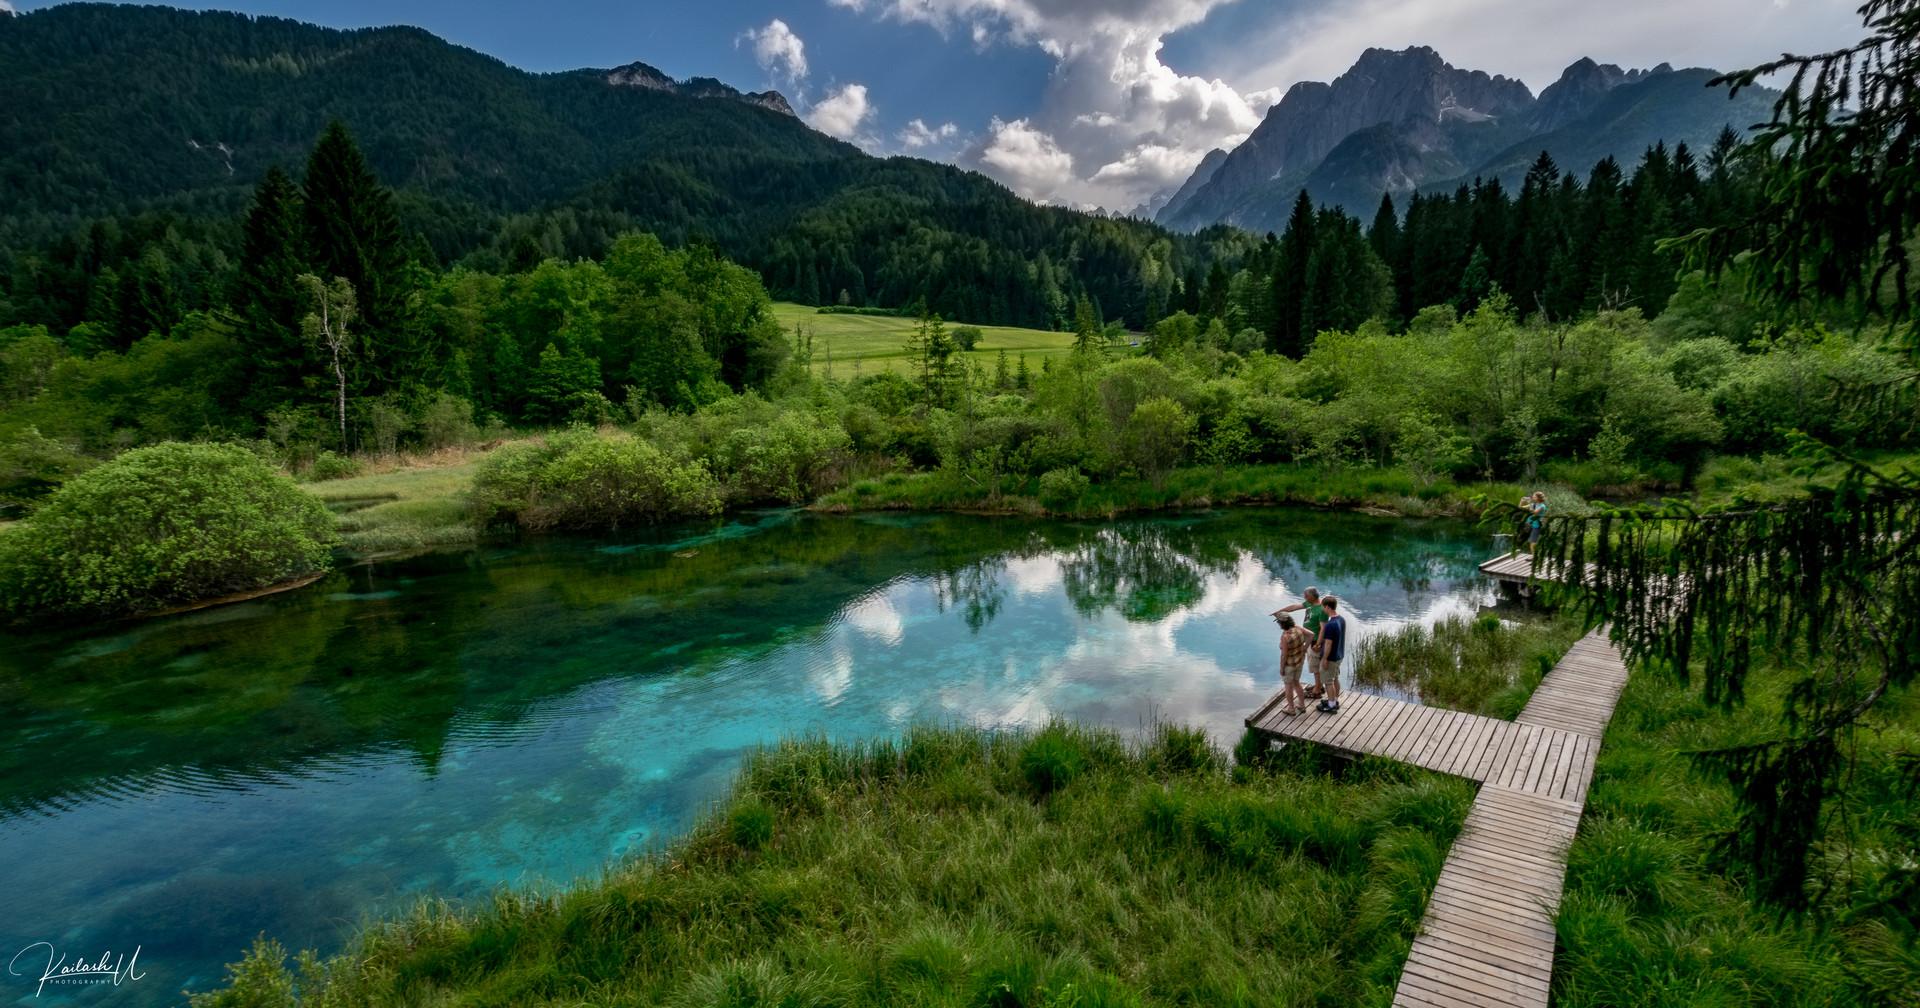 Reflection, Slovenia